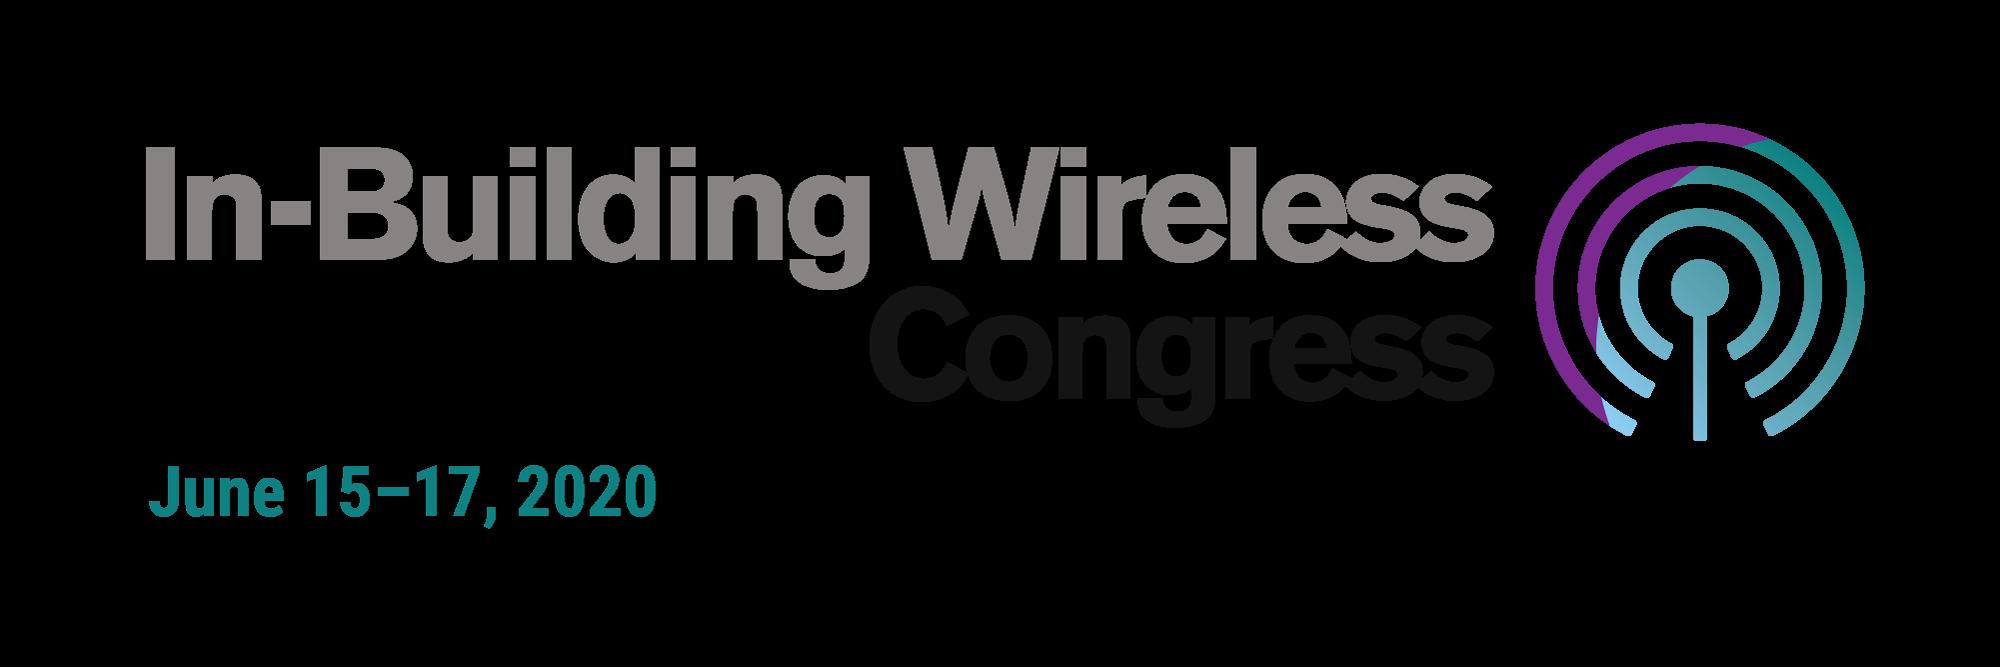 IBW Congress 2020 Logo